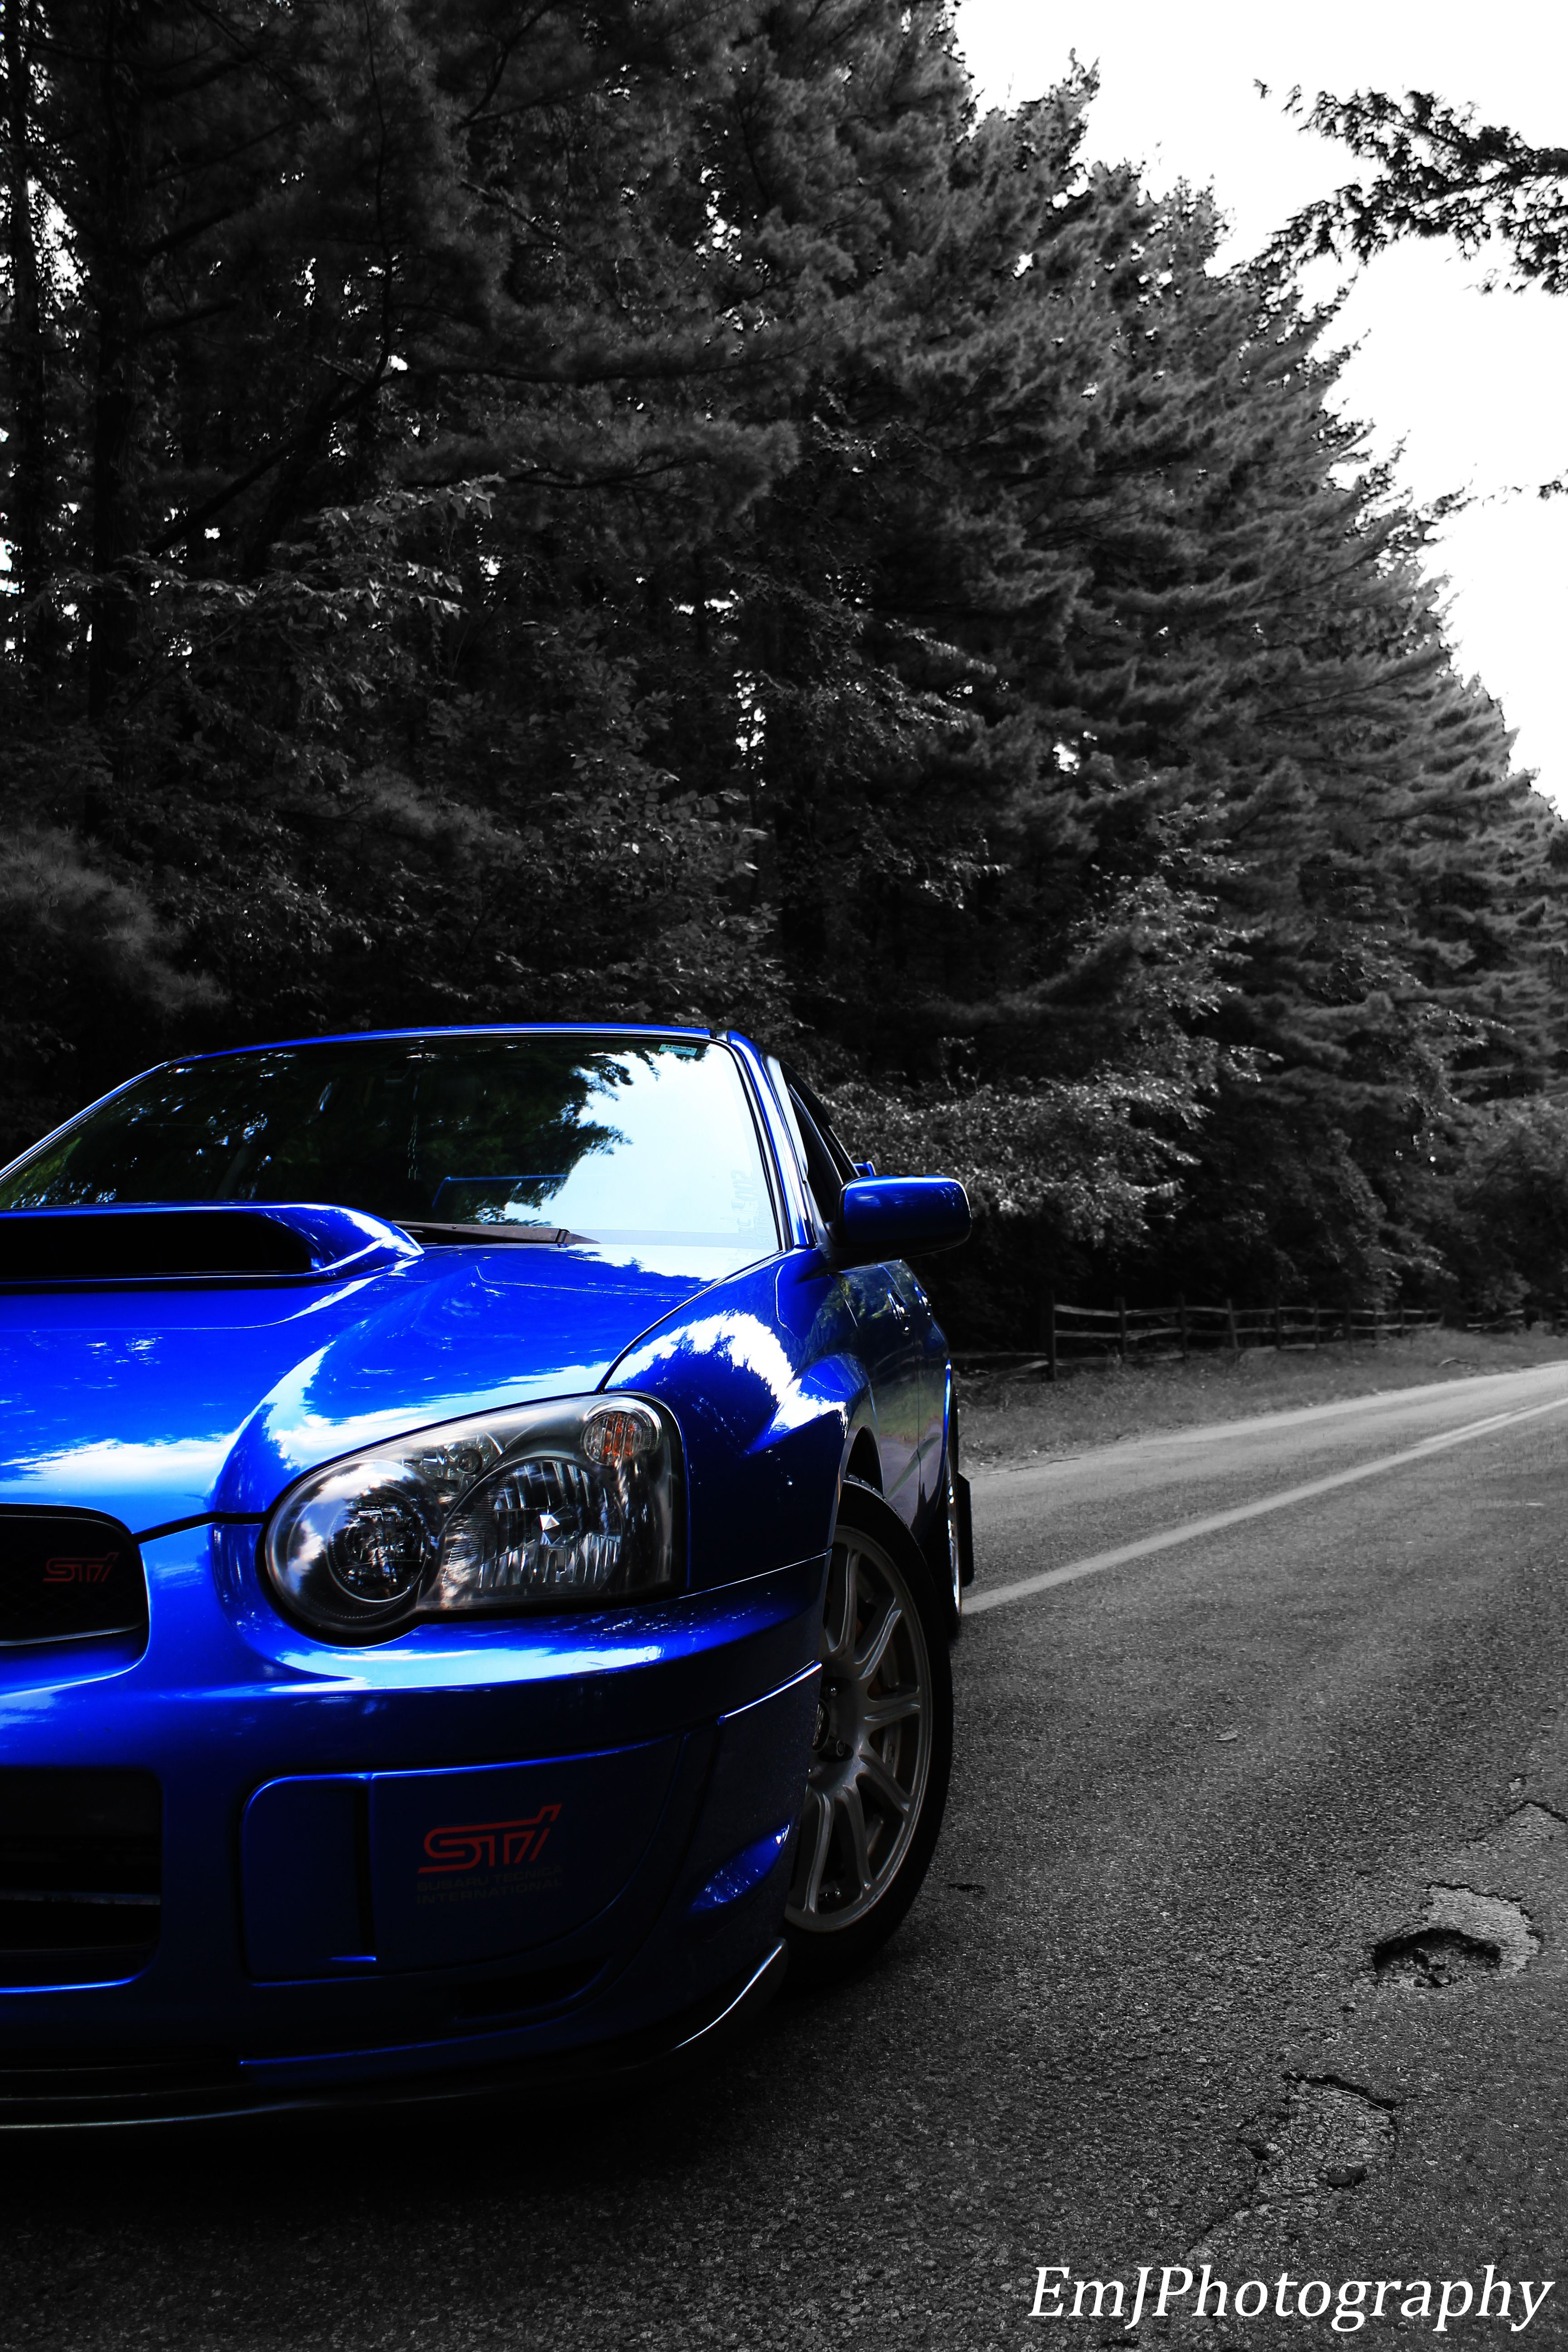 Subaru impreza wrx sti subaru pinterest subaru impreza subaru impreza wrx sti vanachro Choice Image